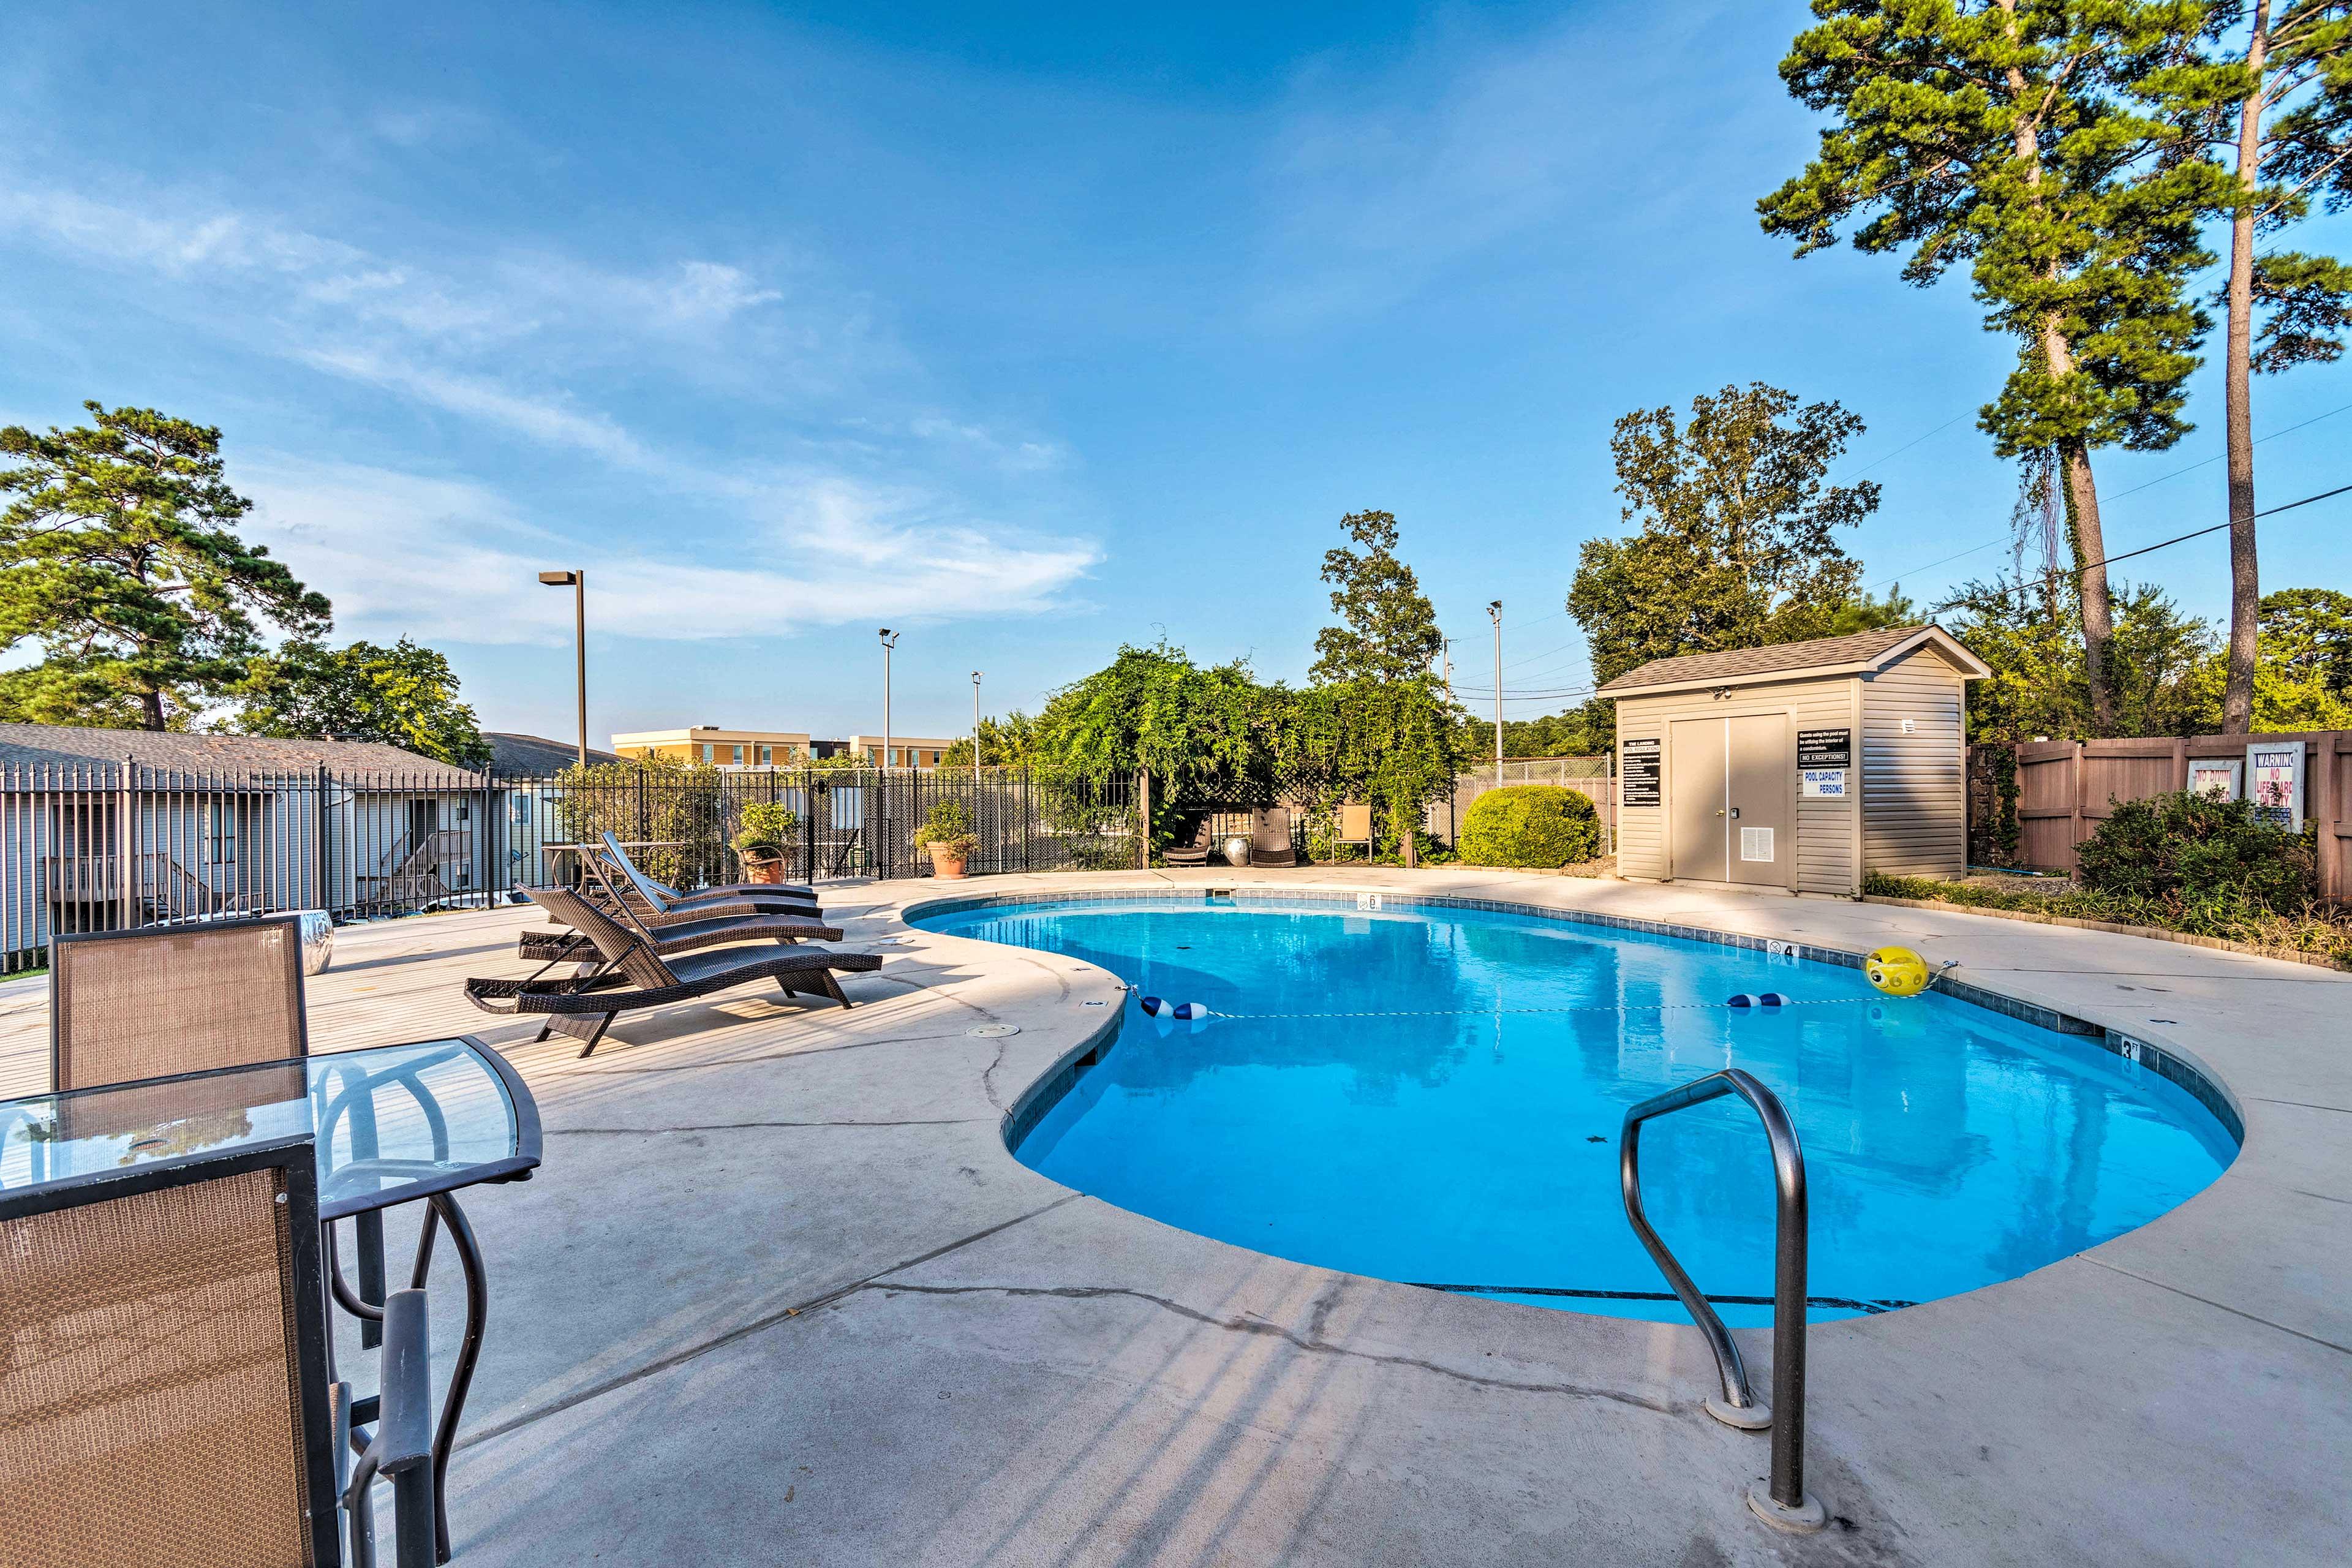 The pool is mere steps away!